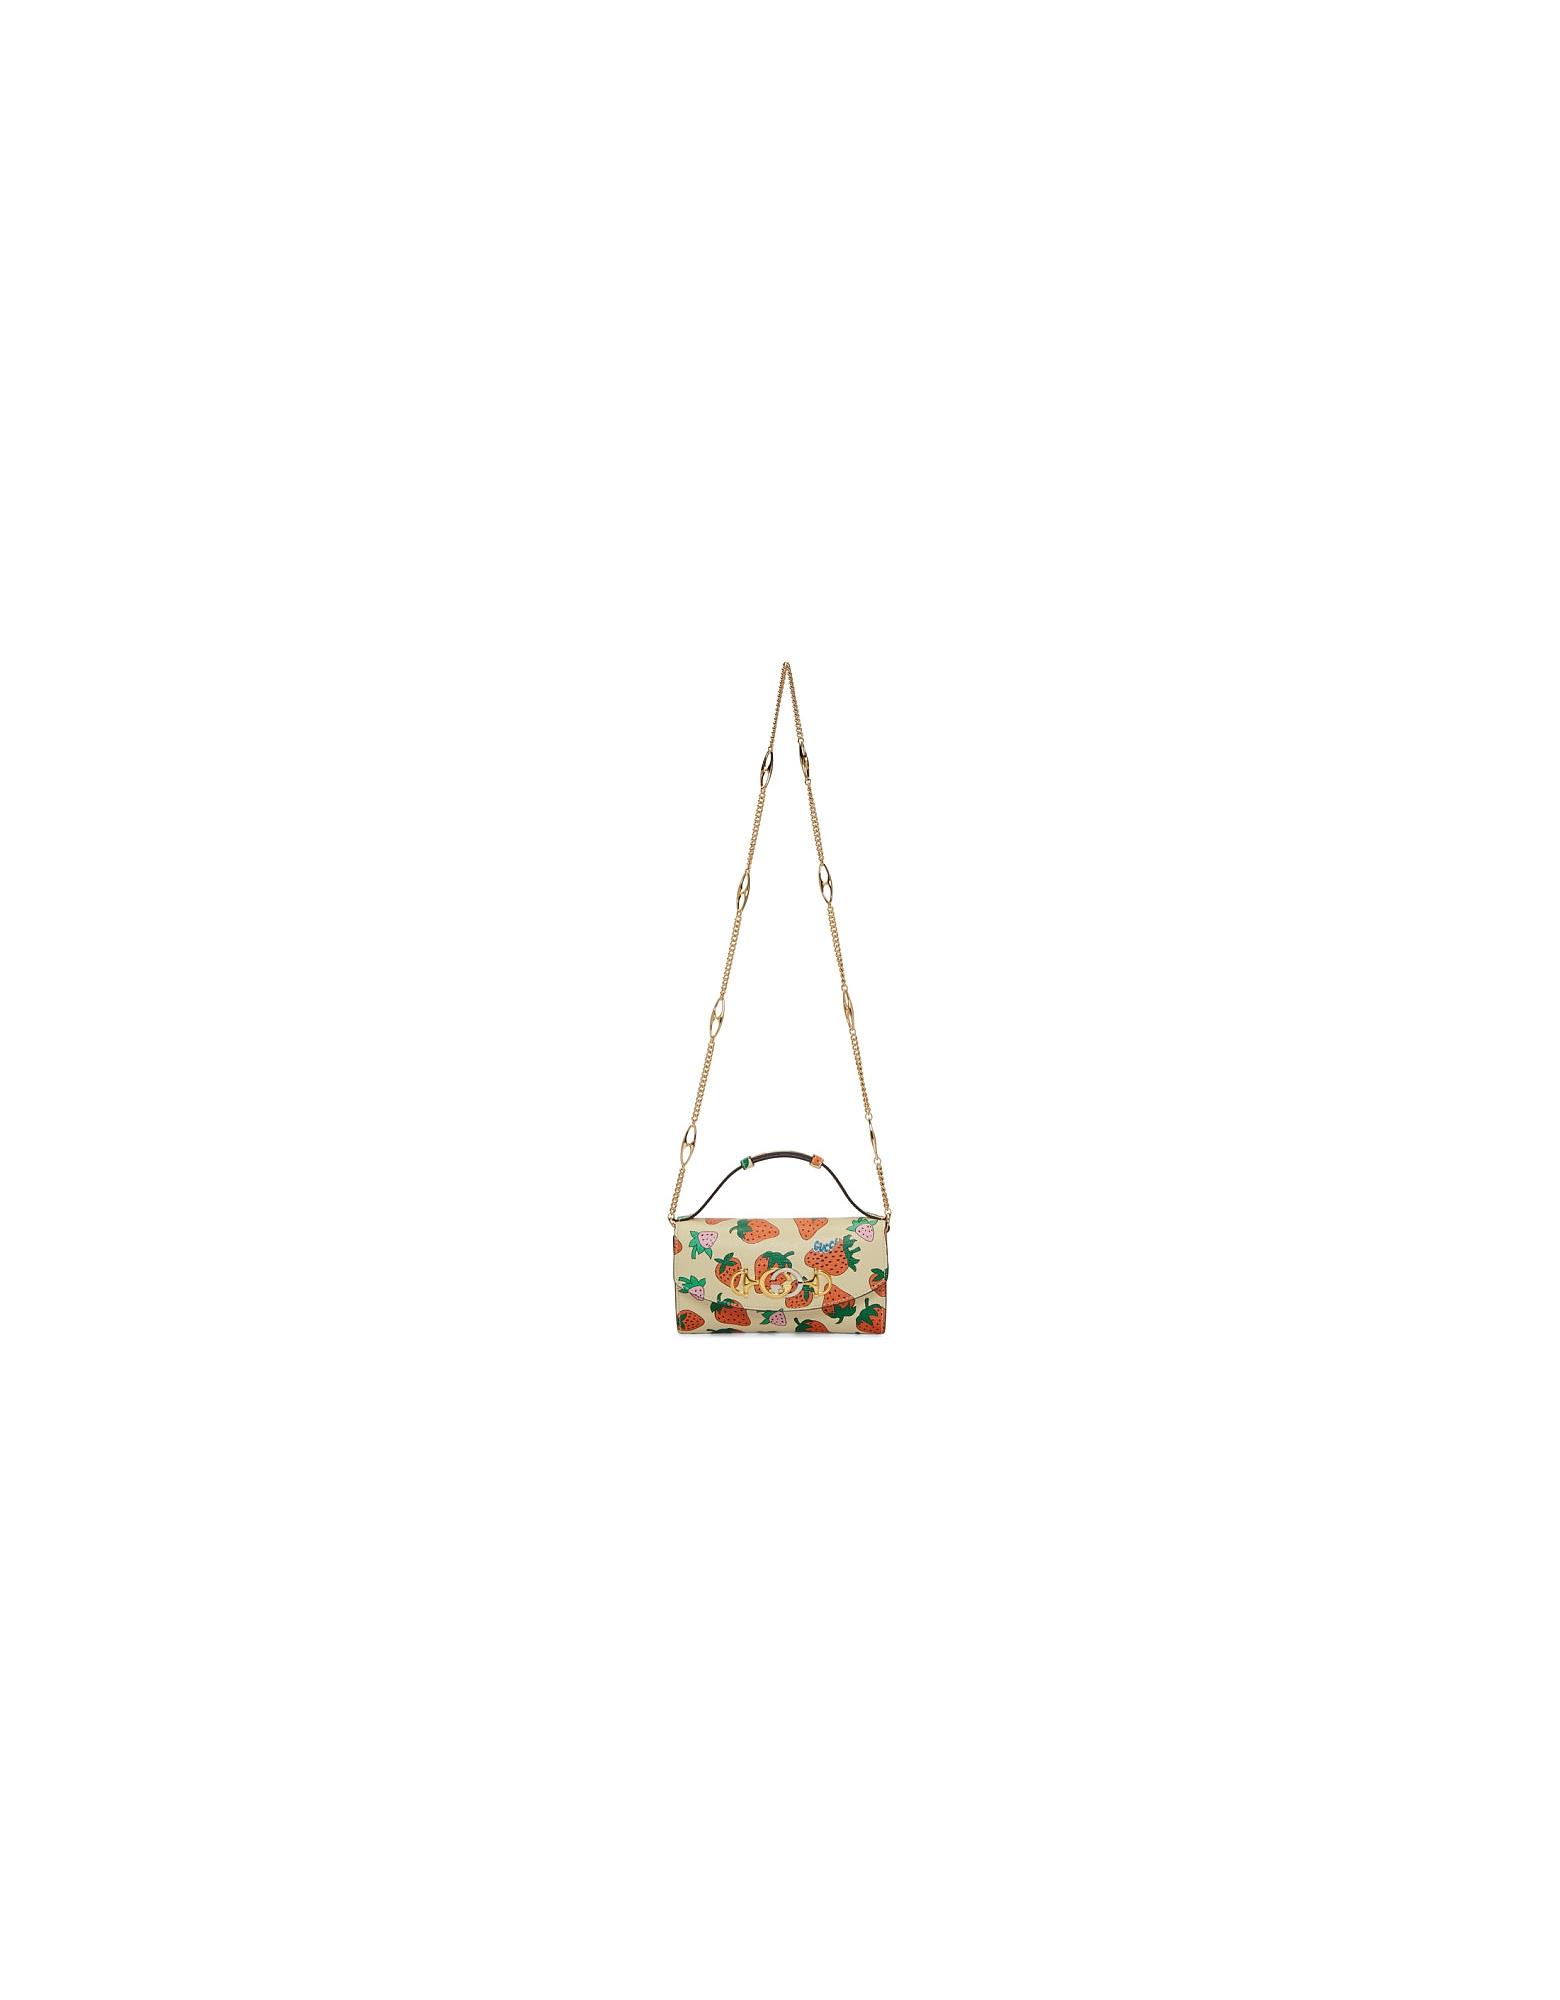 Gucci Designer Handbags, Off-White Mini Zumi Strawberry Shoulder Bag